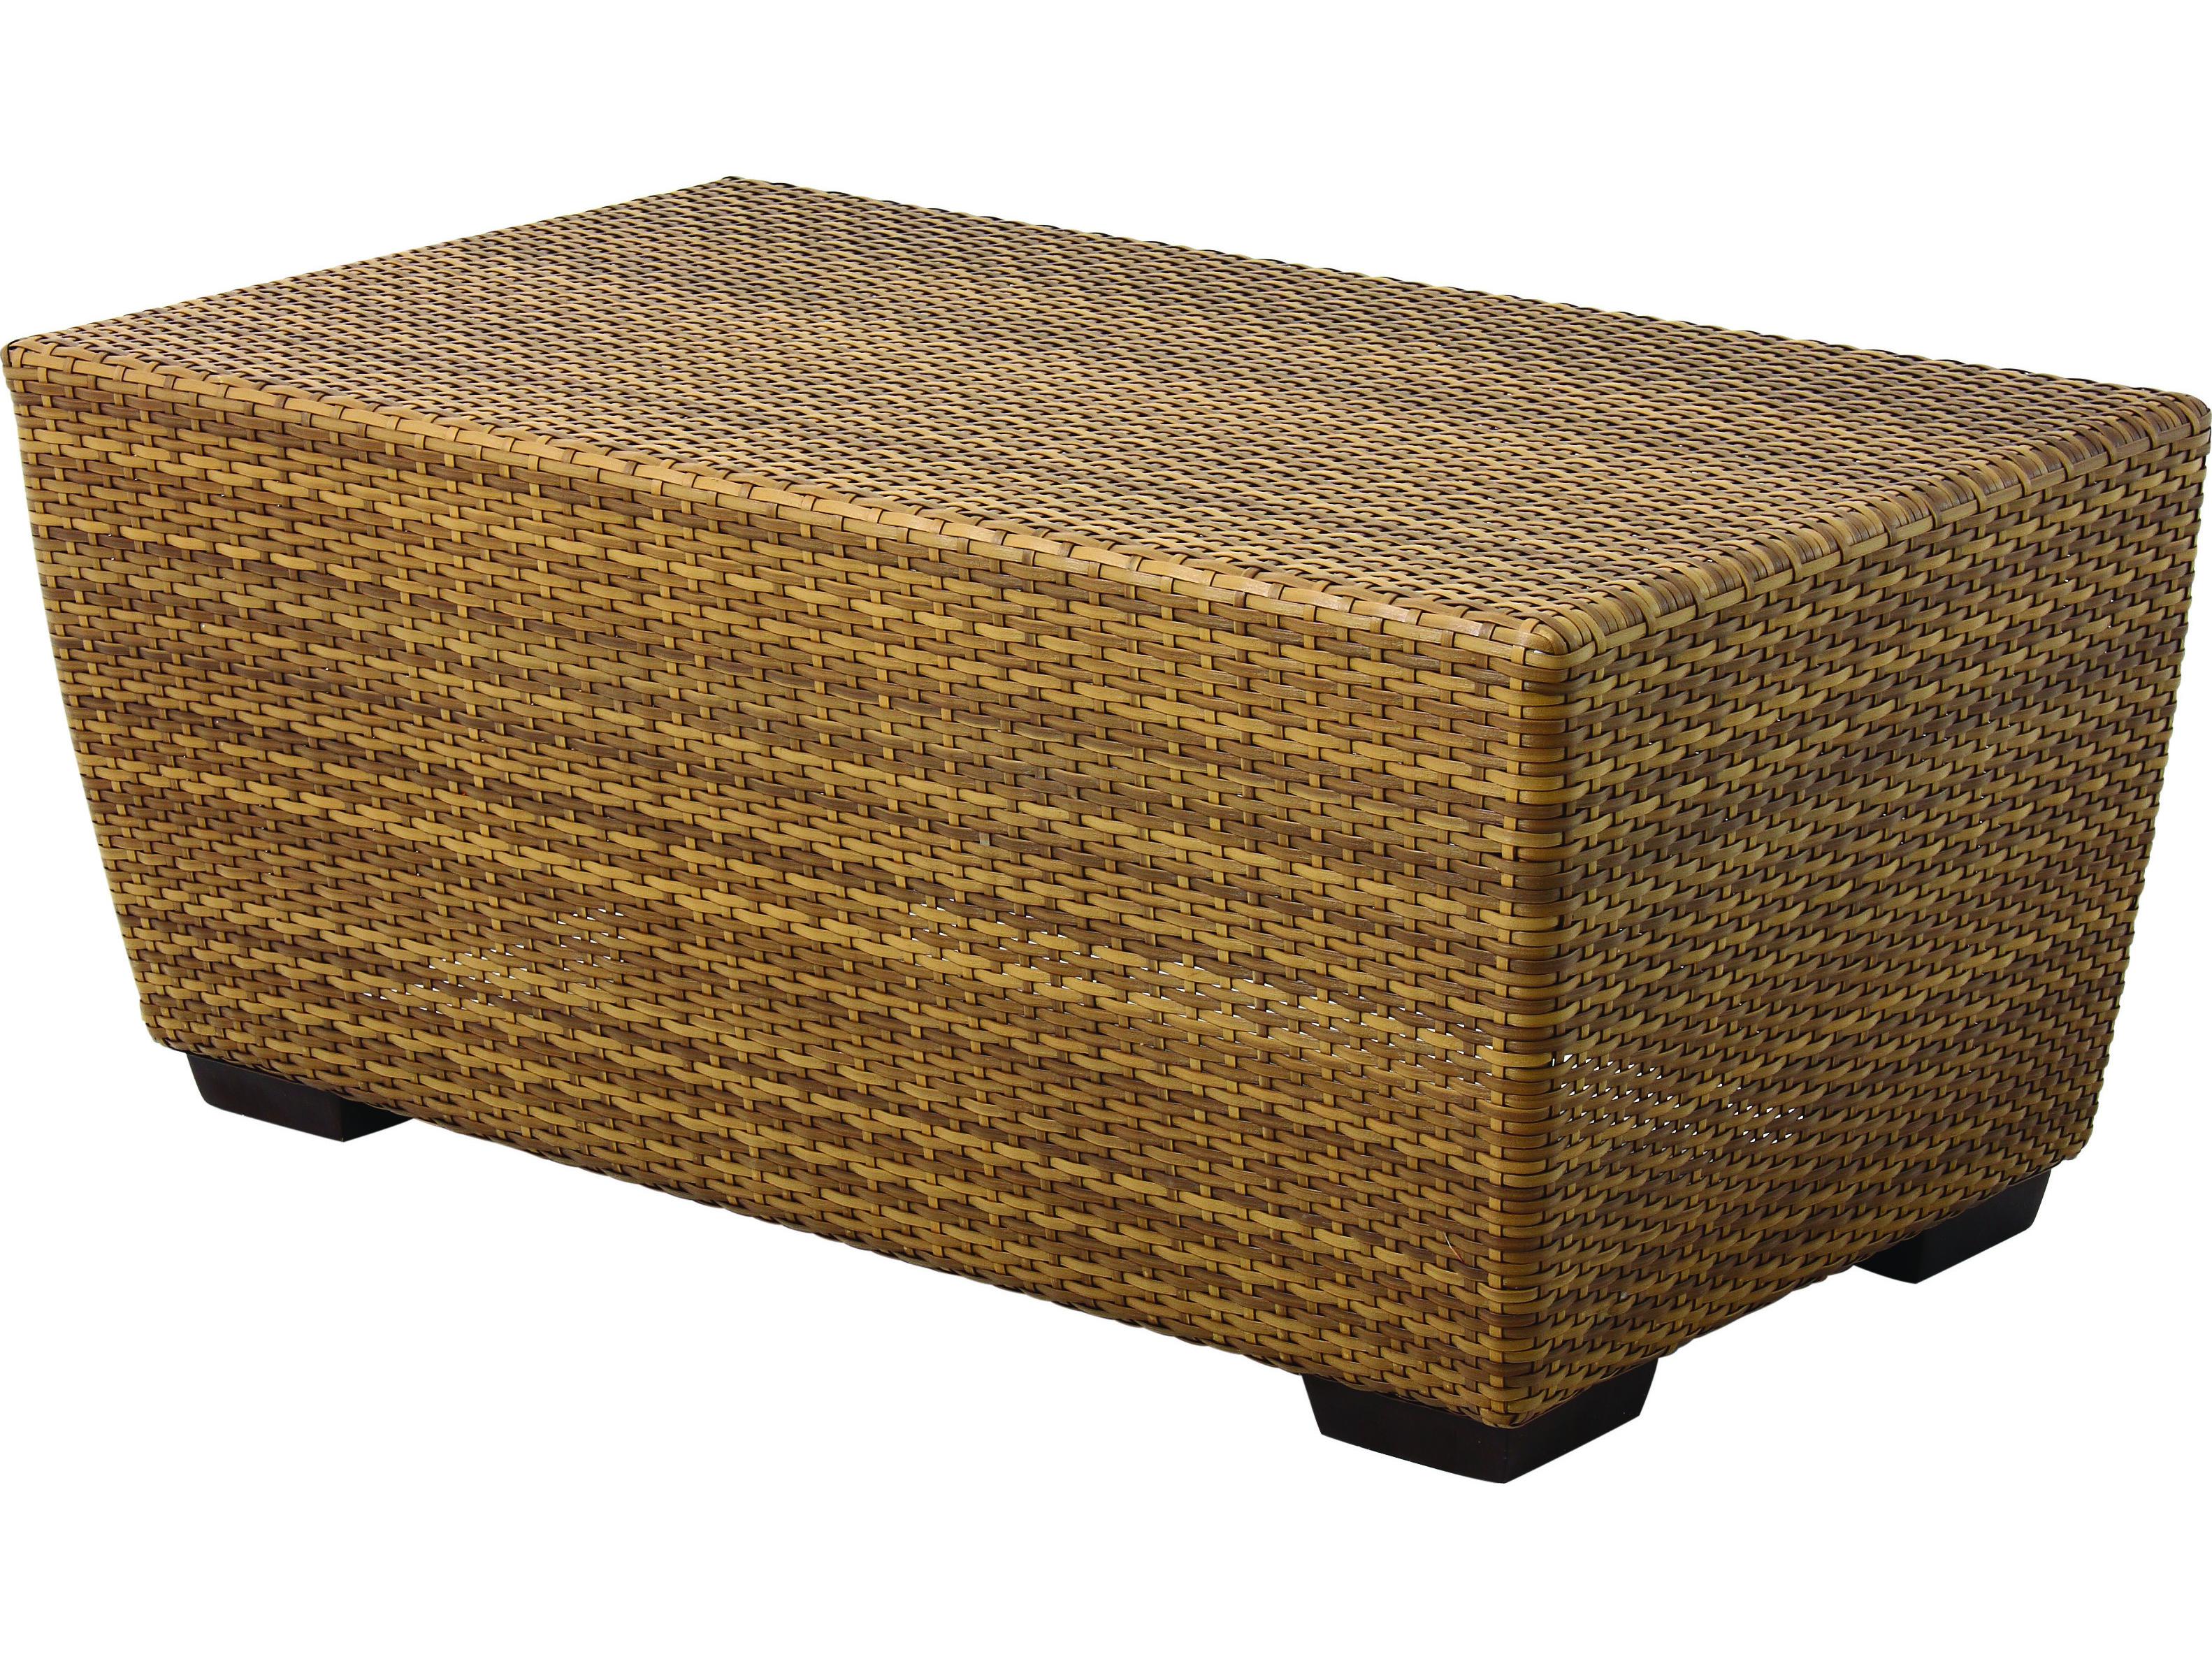 Whitecraft saddleback wicker 42 x 24 rectangular coffee for Wicker coffee table